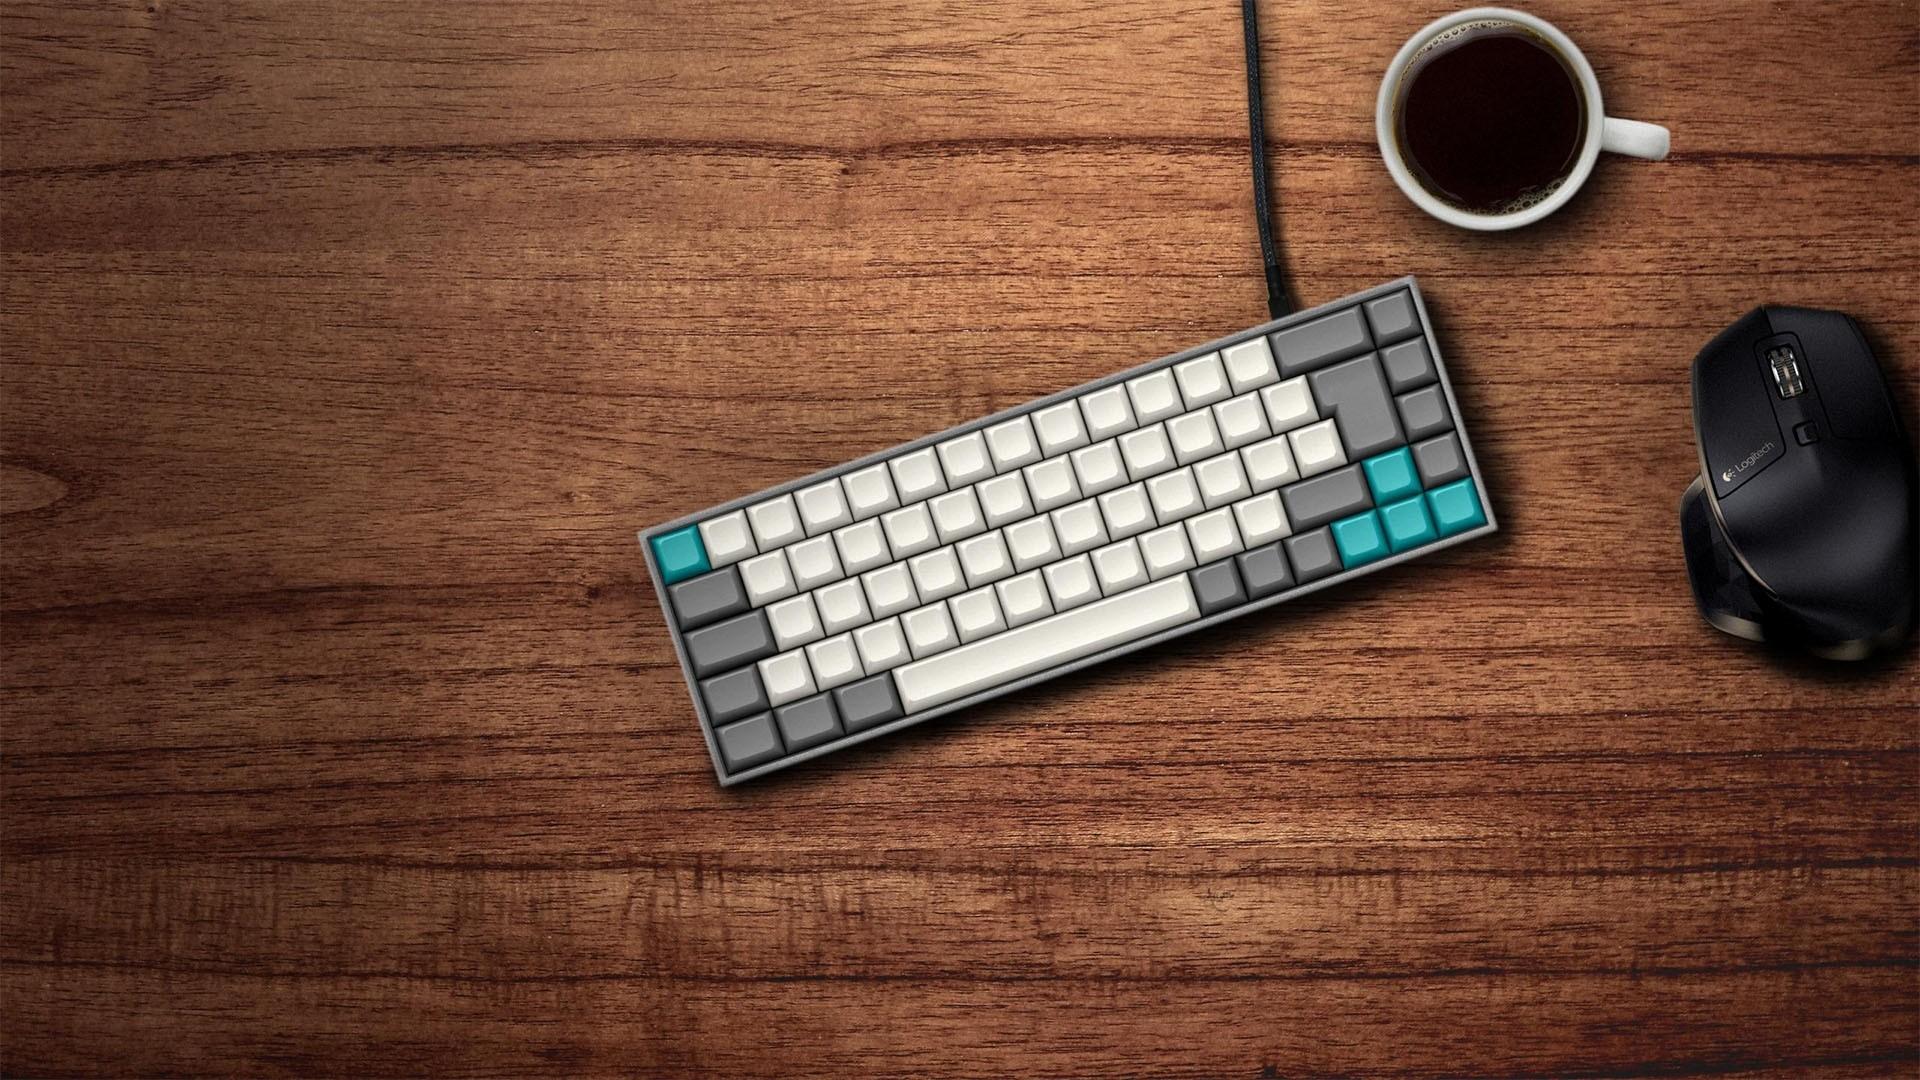 Keyboard computer wallpaper